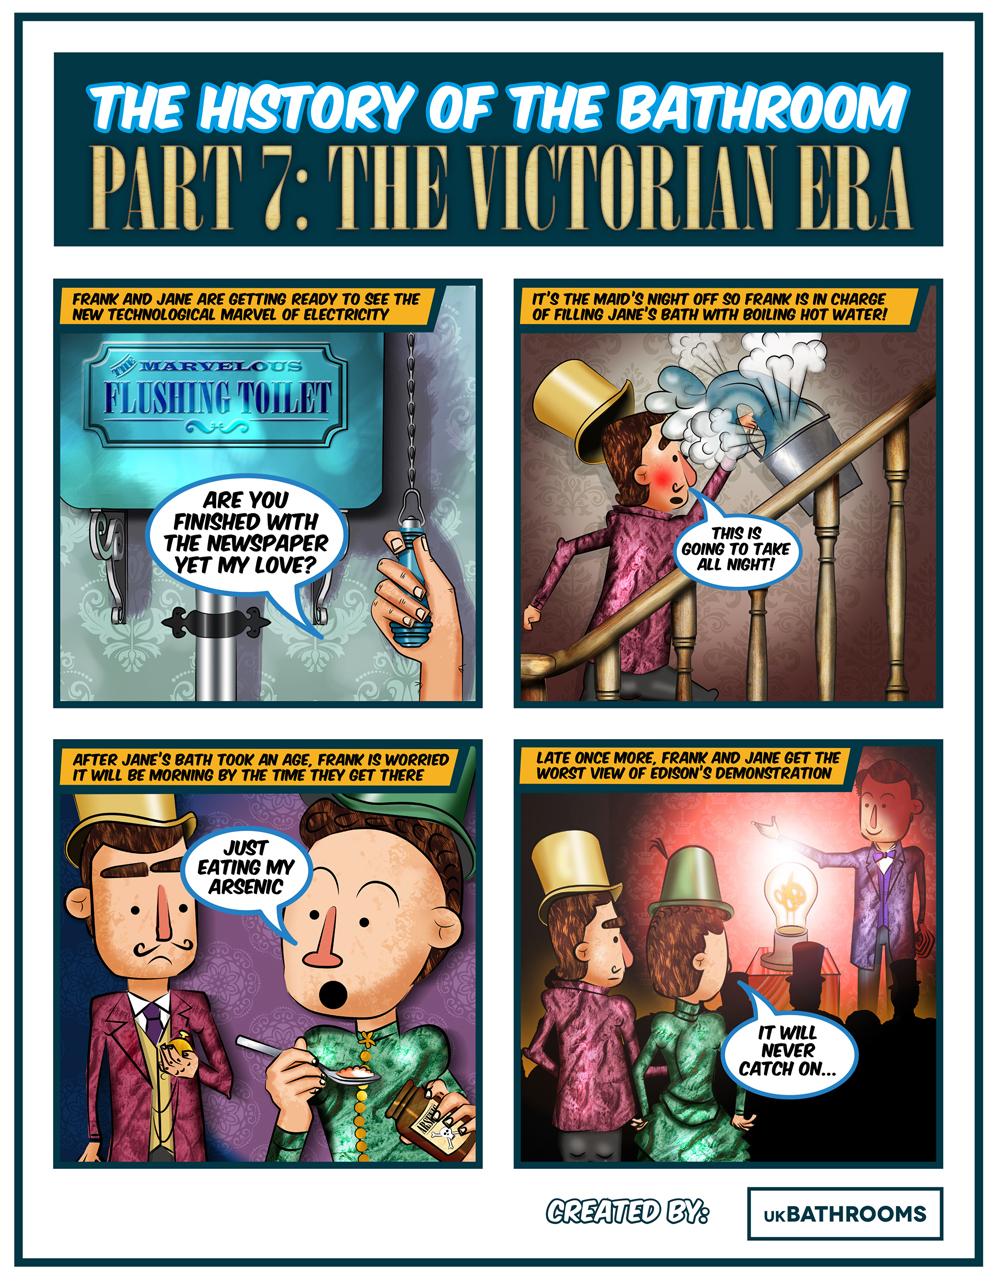 Part 7 The Victorian Era